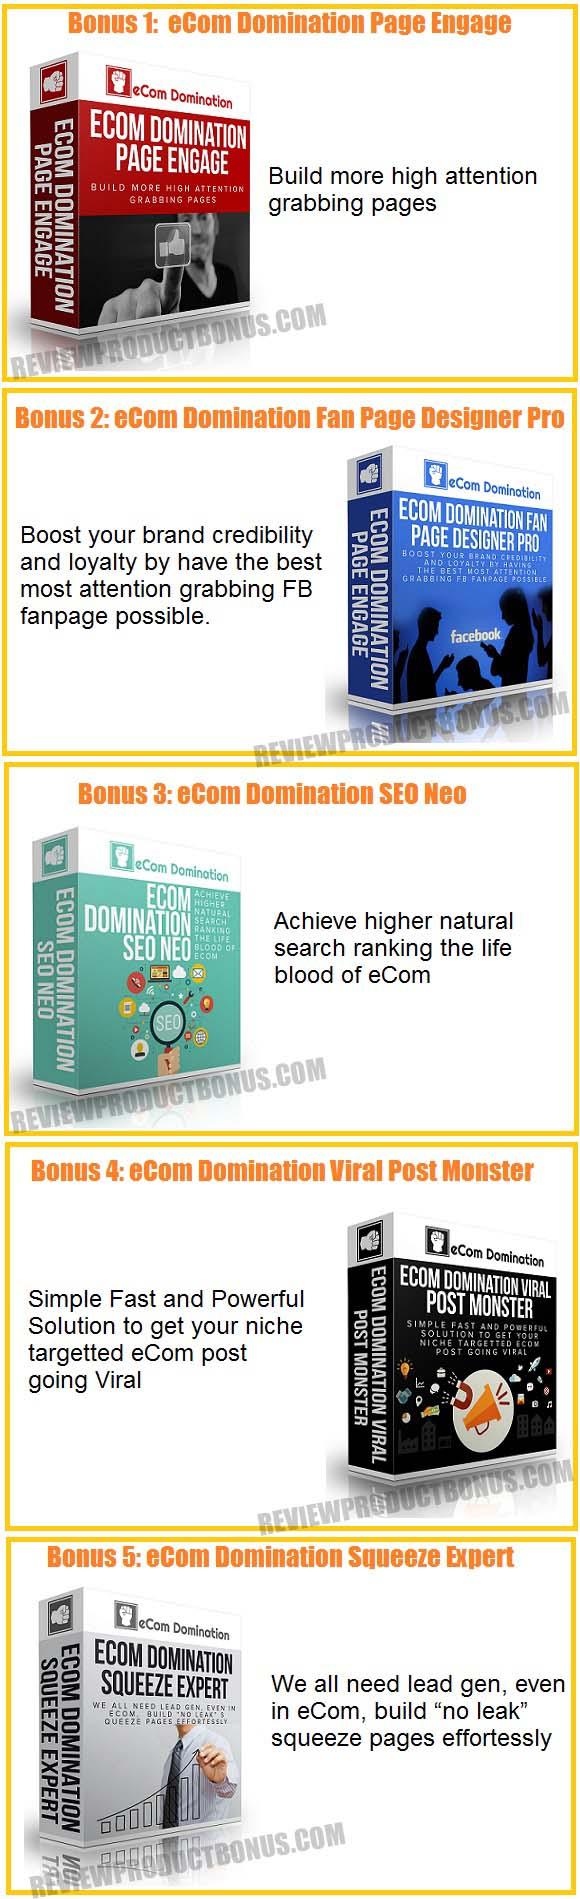 eCom Domination Bonus